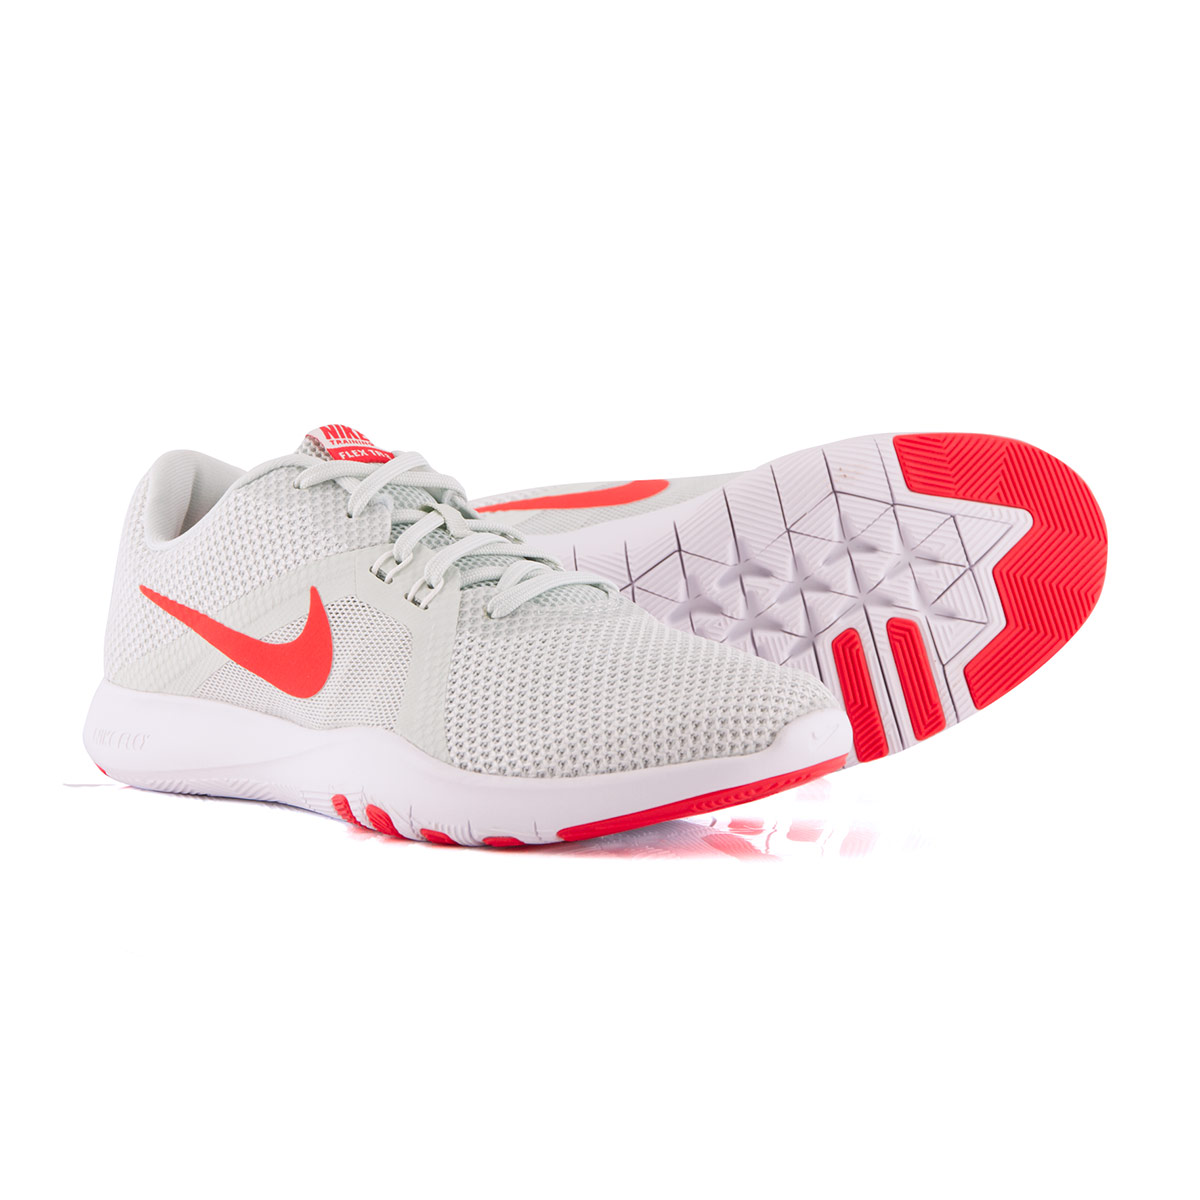 9f0a7e990e96 Nike Womens Flex 8 Trainers Barely Grey - Front